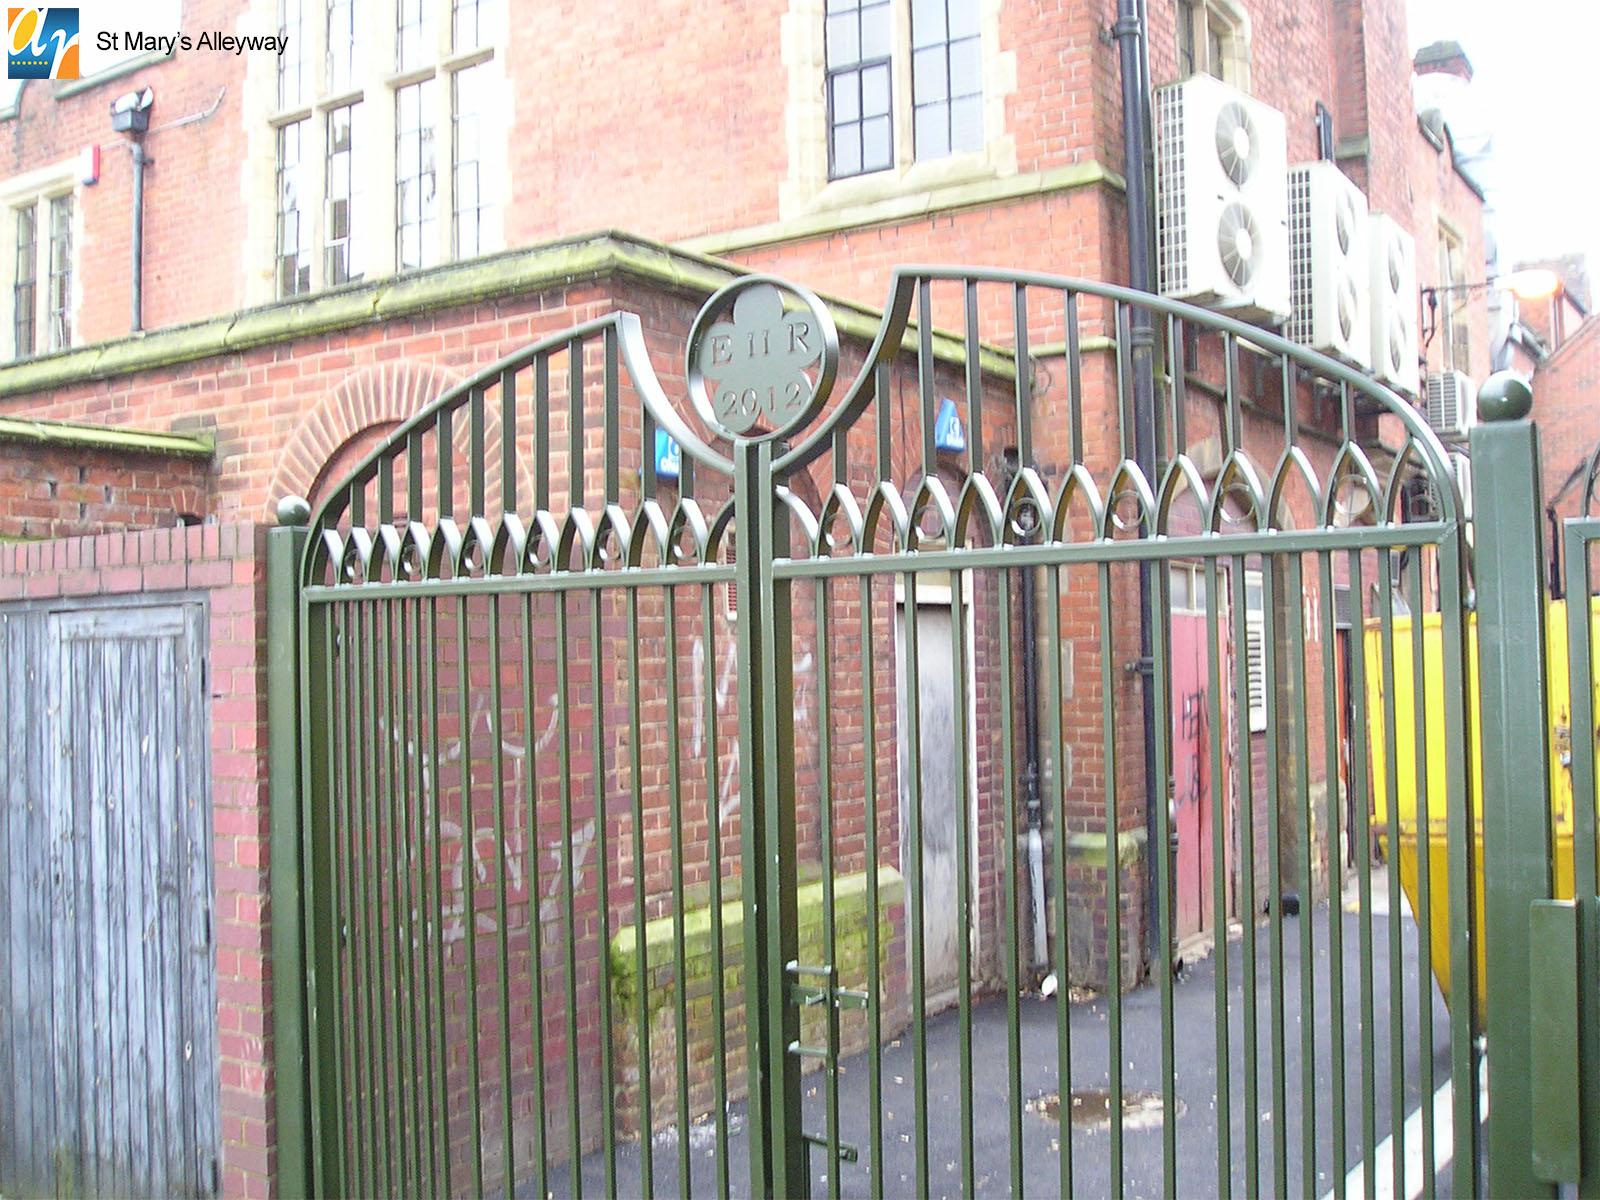 St. Mary's Alleyway metal gate